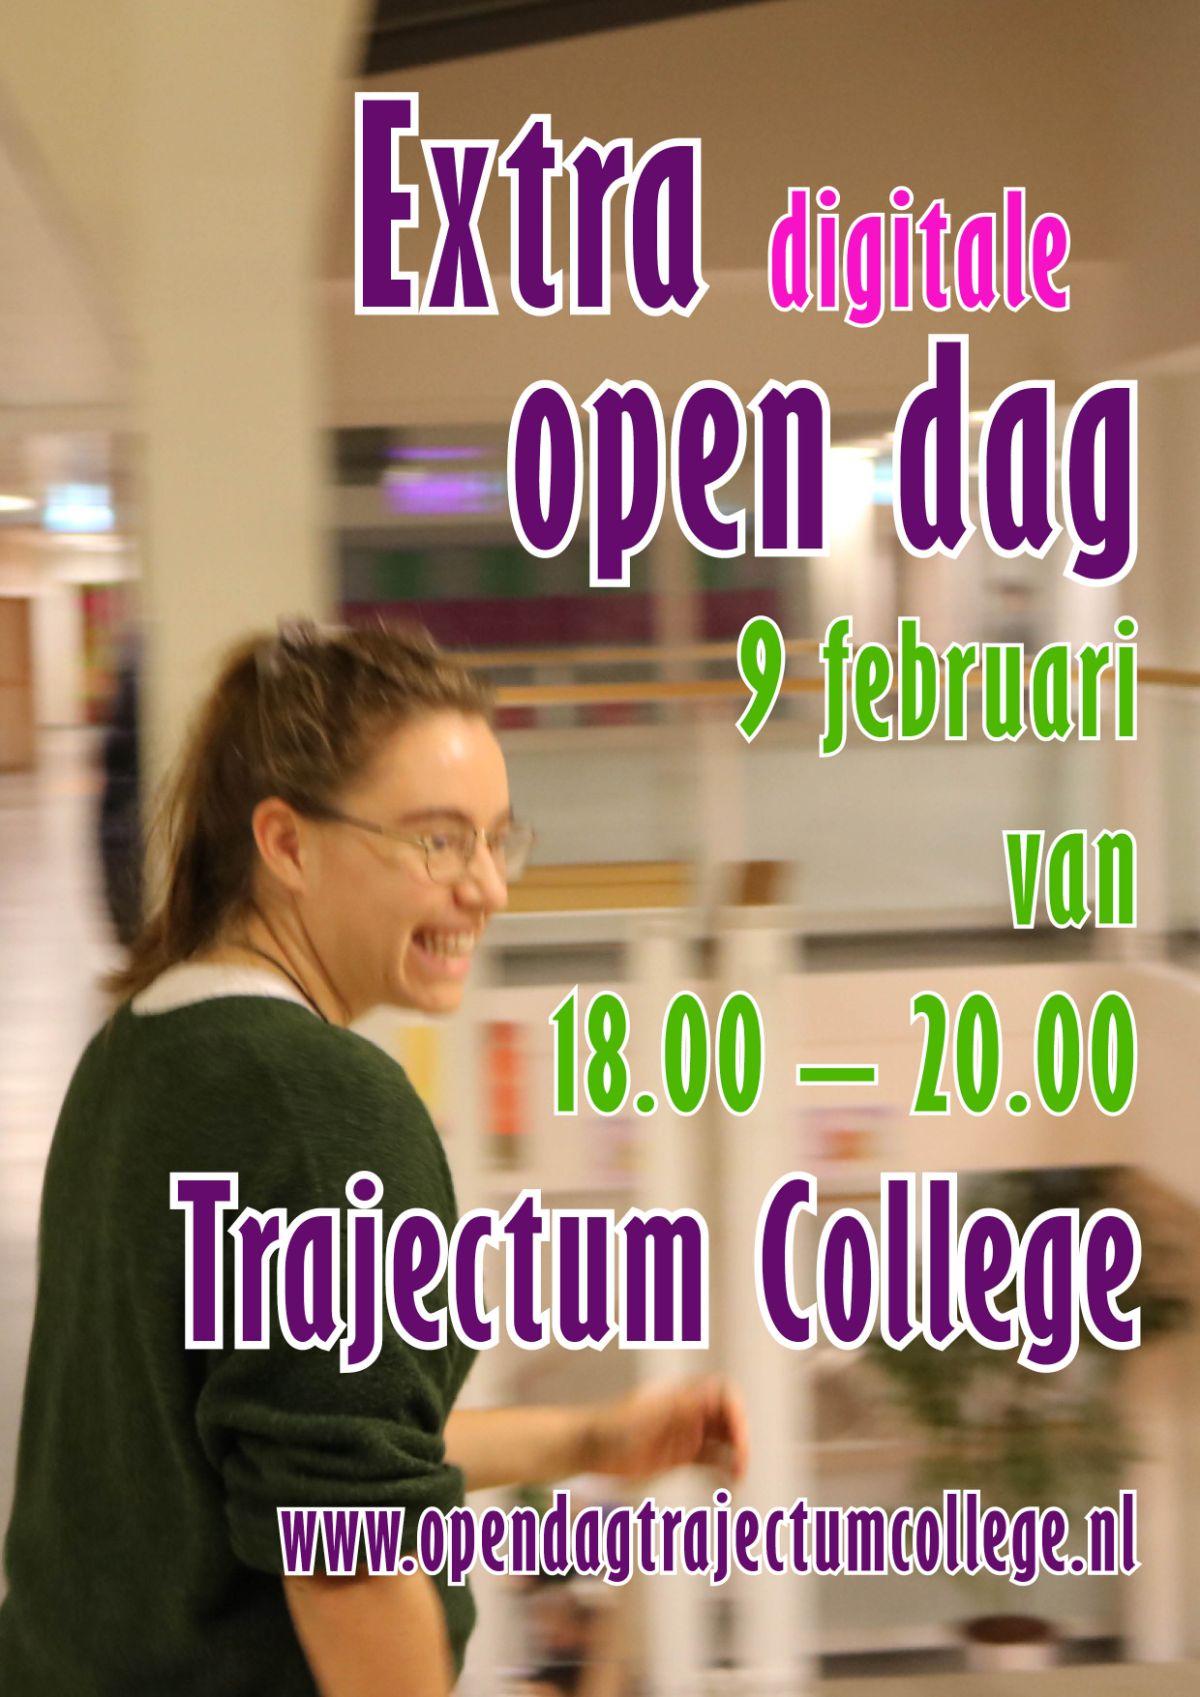 Extra open dag